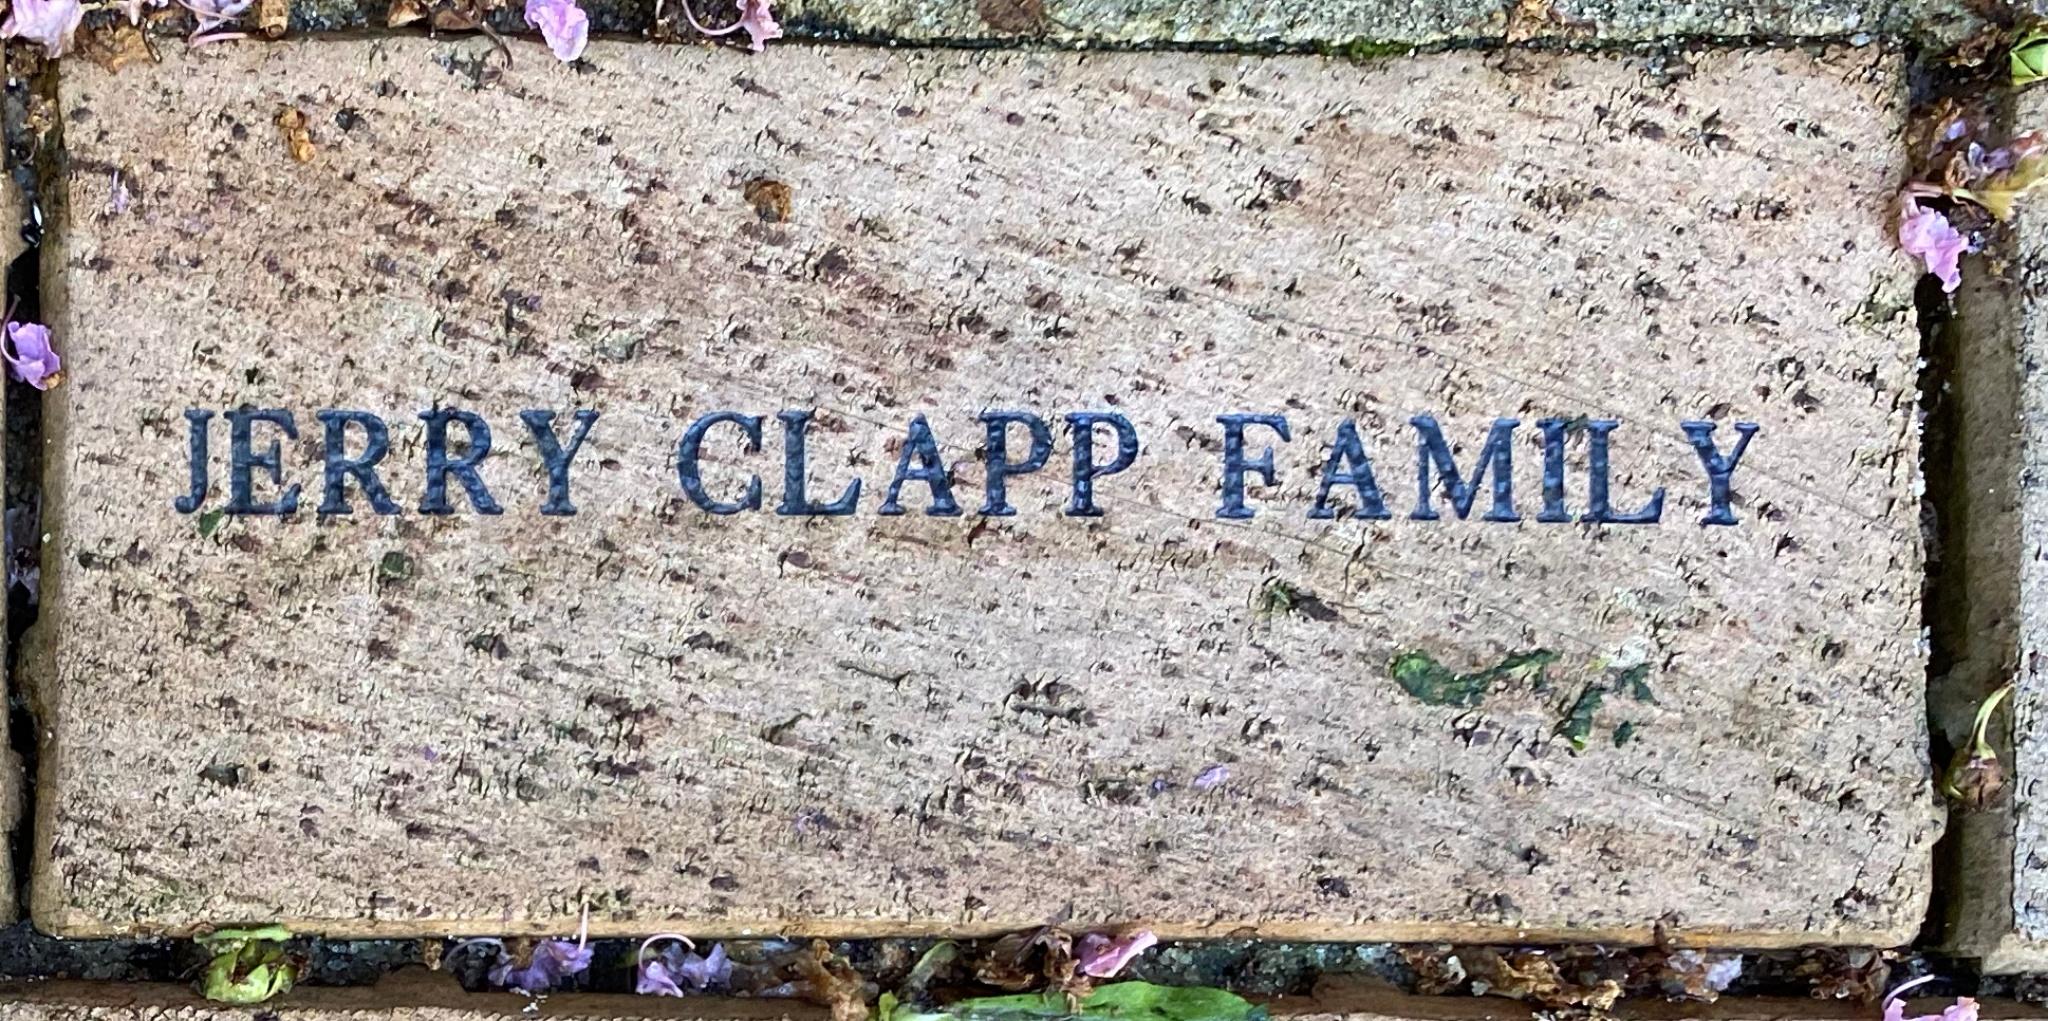 JERRY CLAPP FAMILY